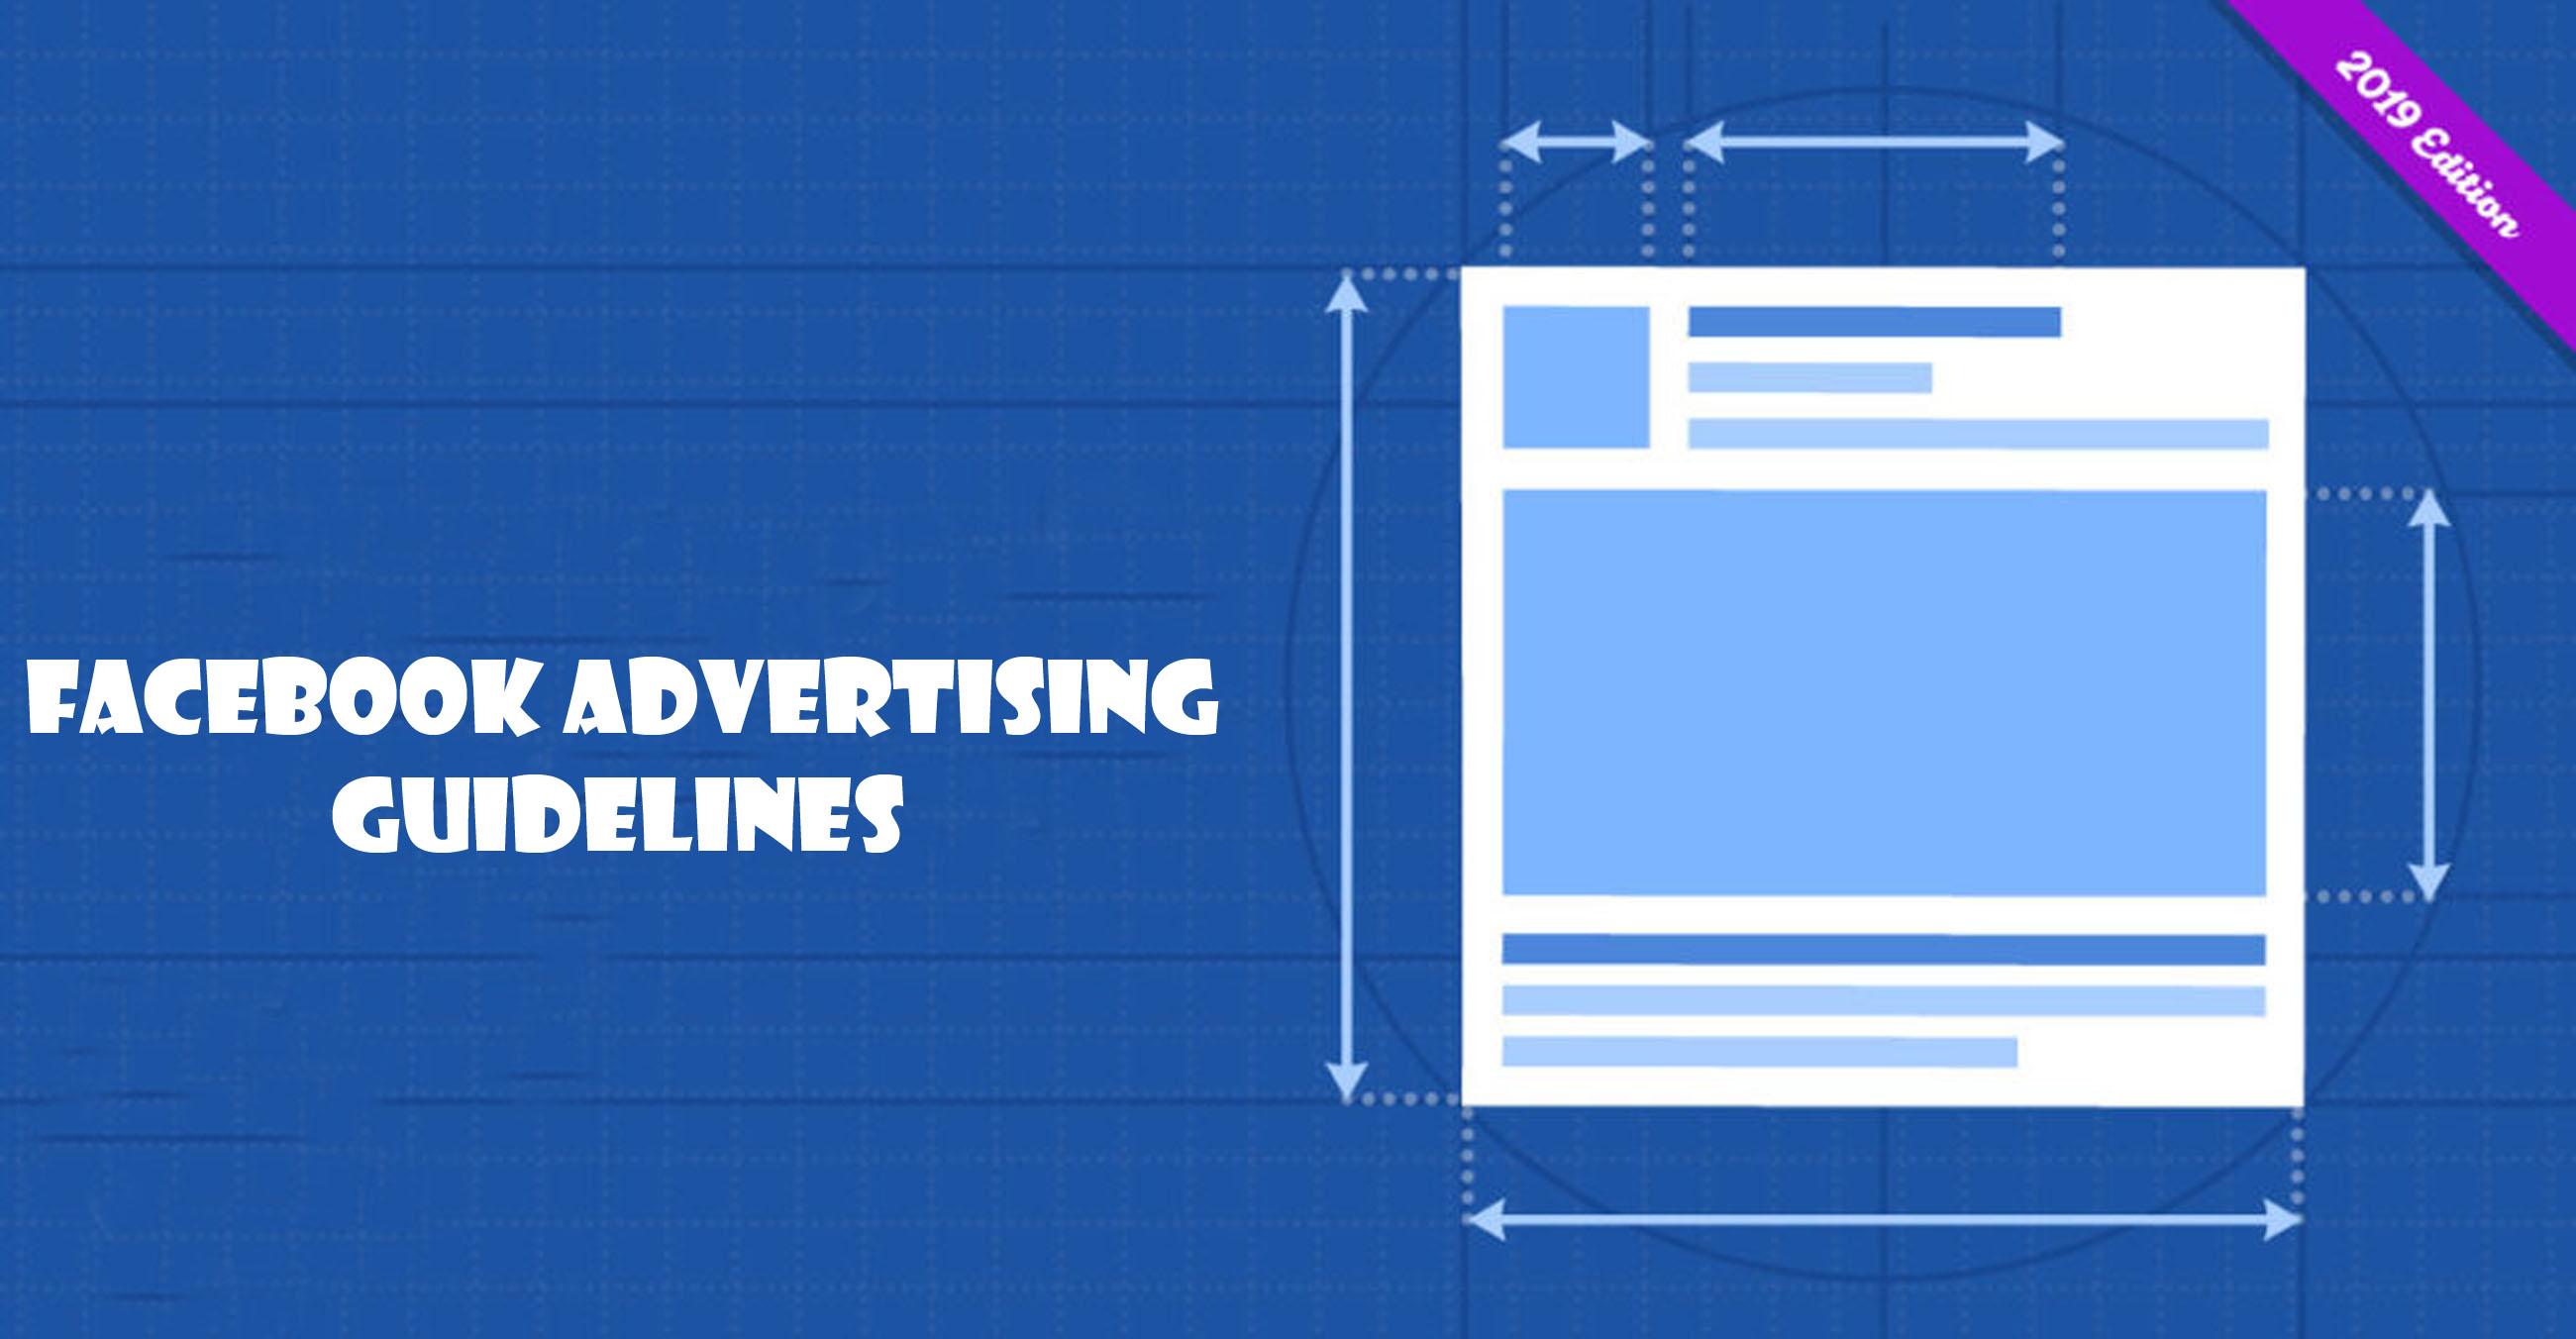 Facebook Advertising Guidelines – Facebook Ads